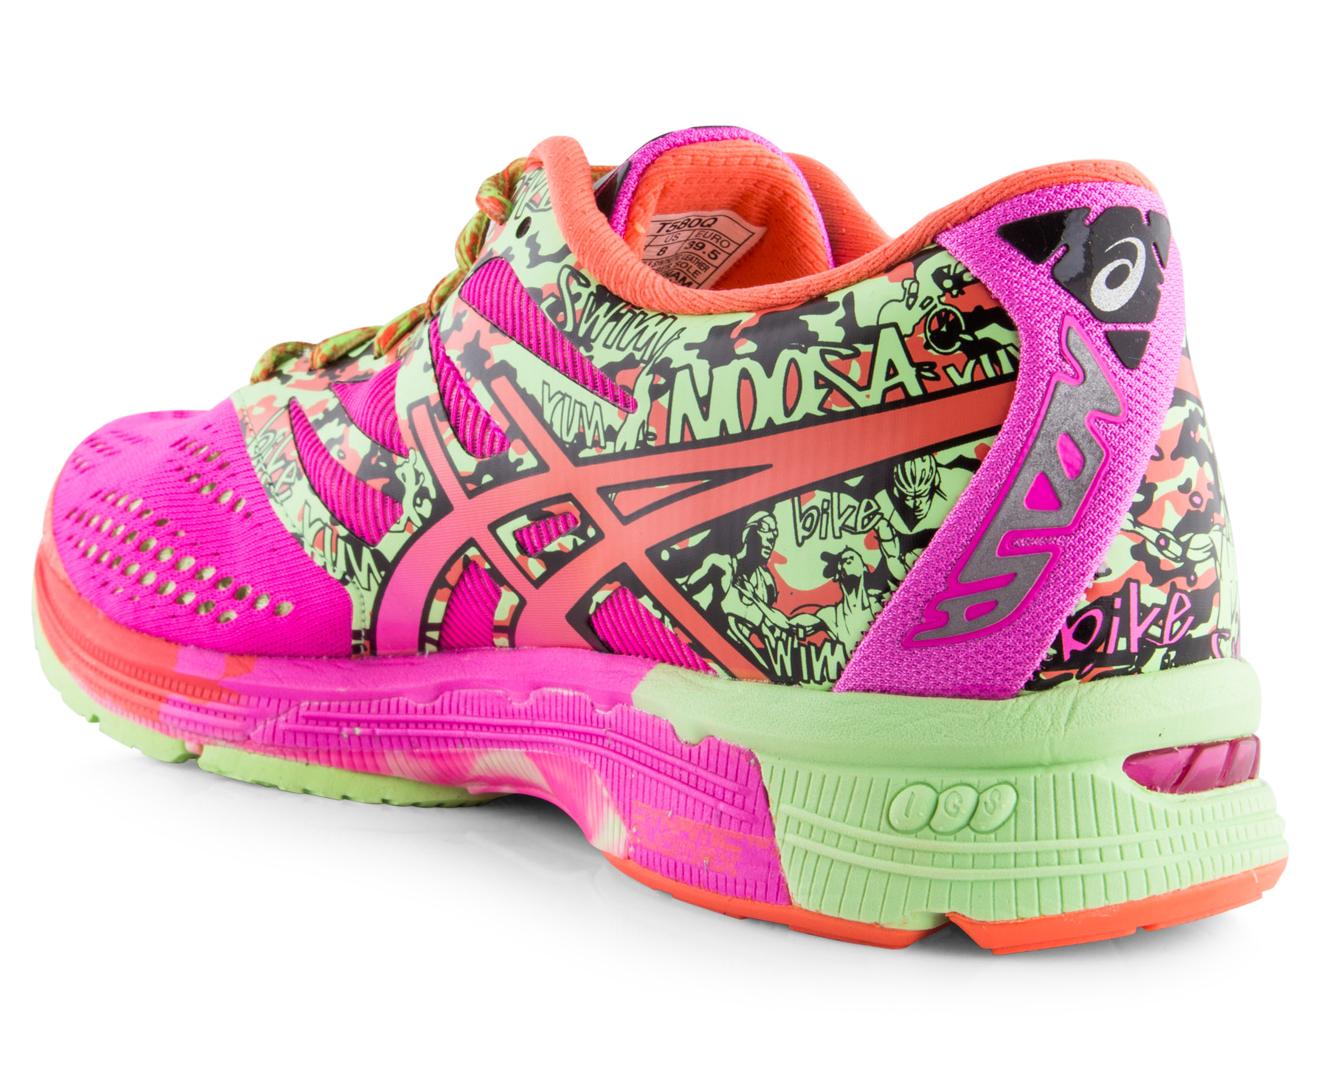 ASICS Women s GEL-Noosa Tri 10 Shoes - Coral Paradise  f8b54ae20e